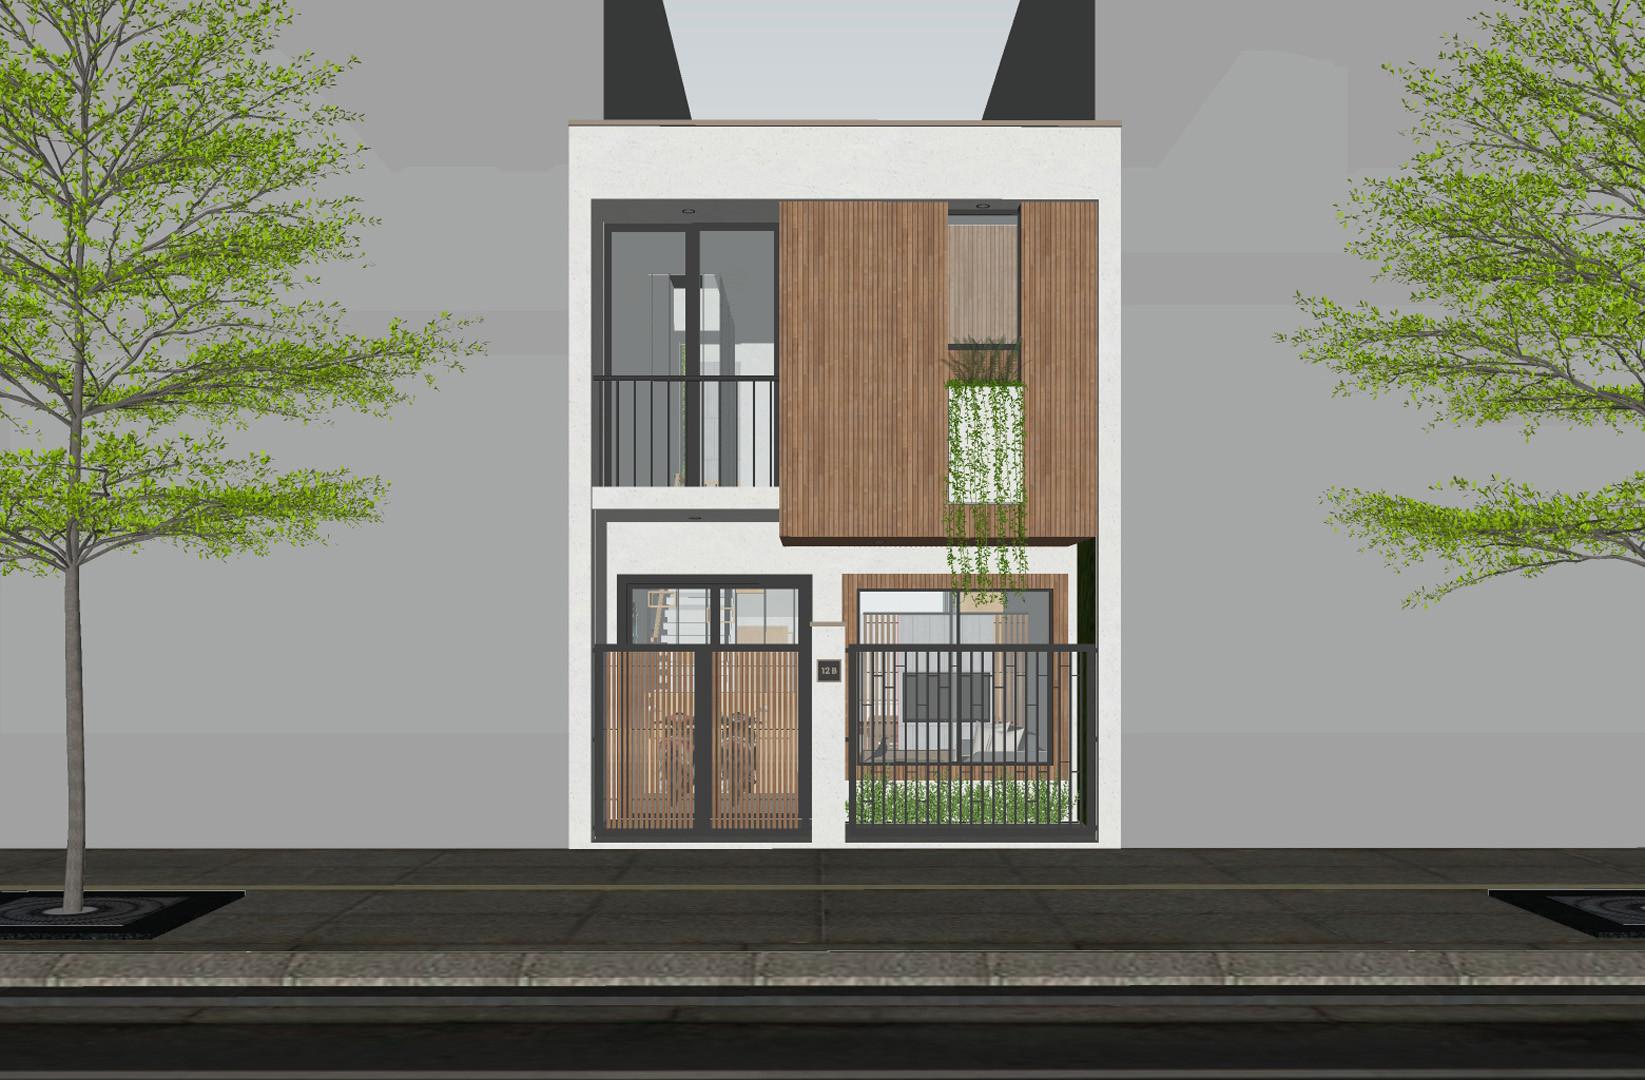 lnd_mrsvanhouse (1).jpg